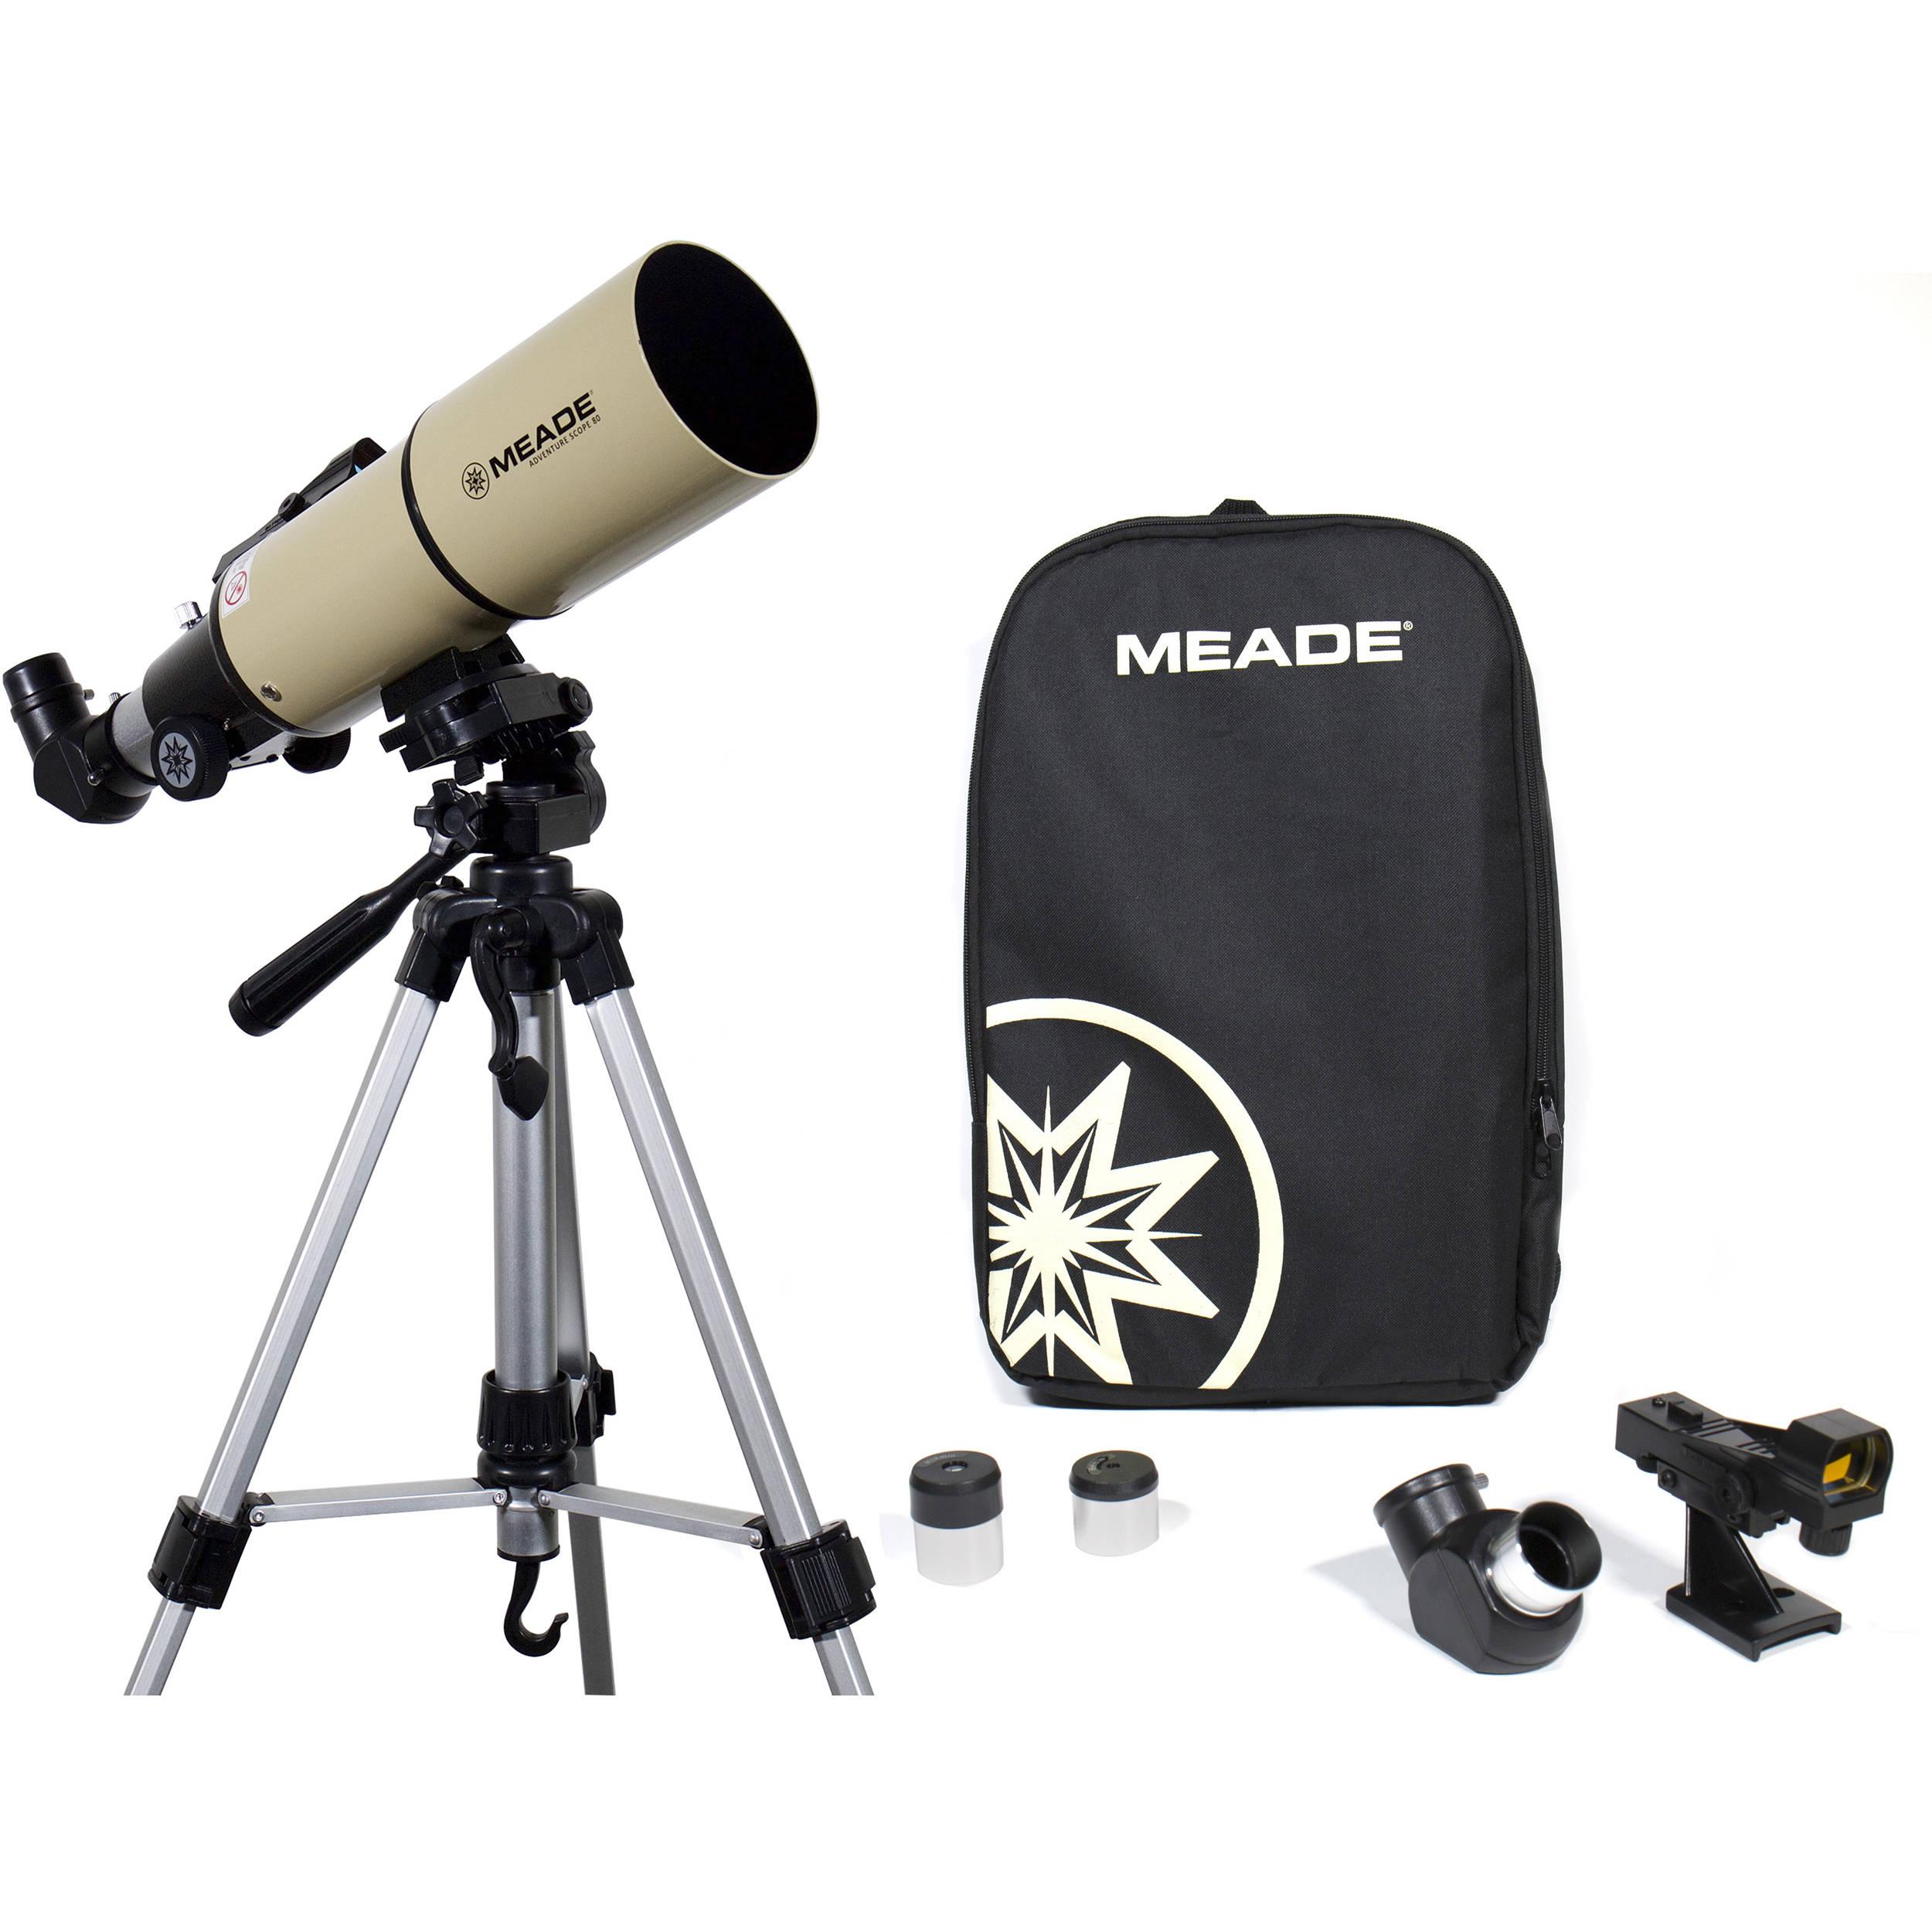 Meade Adventure Scope 80mm f/5 Refractor Telescope